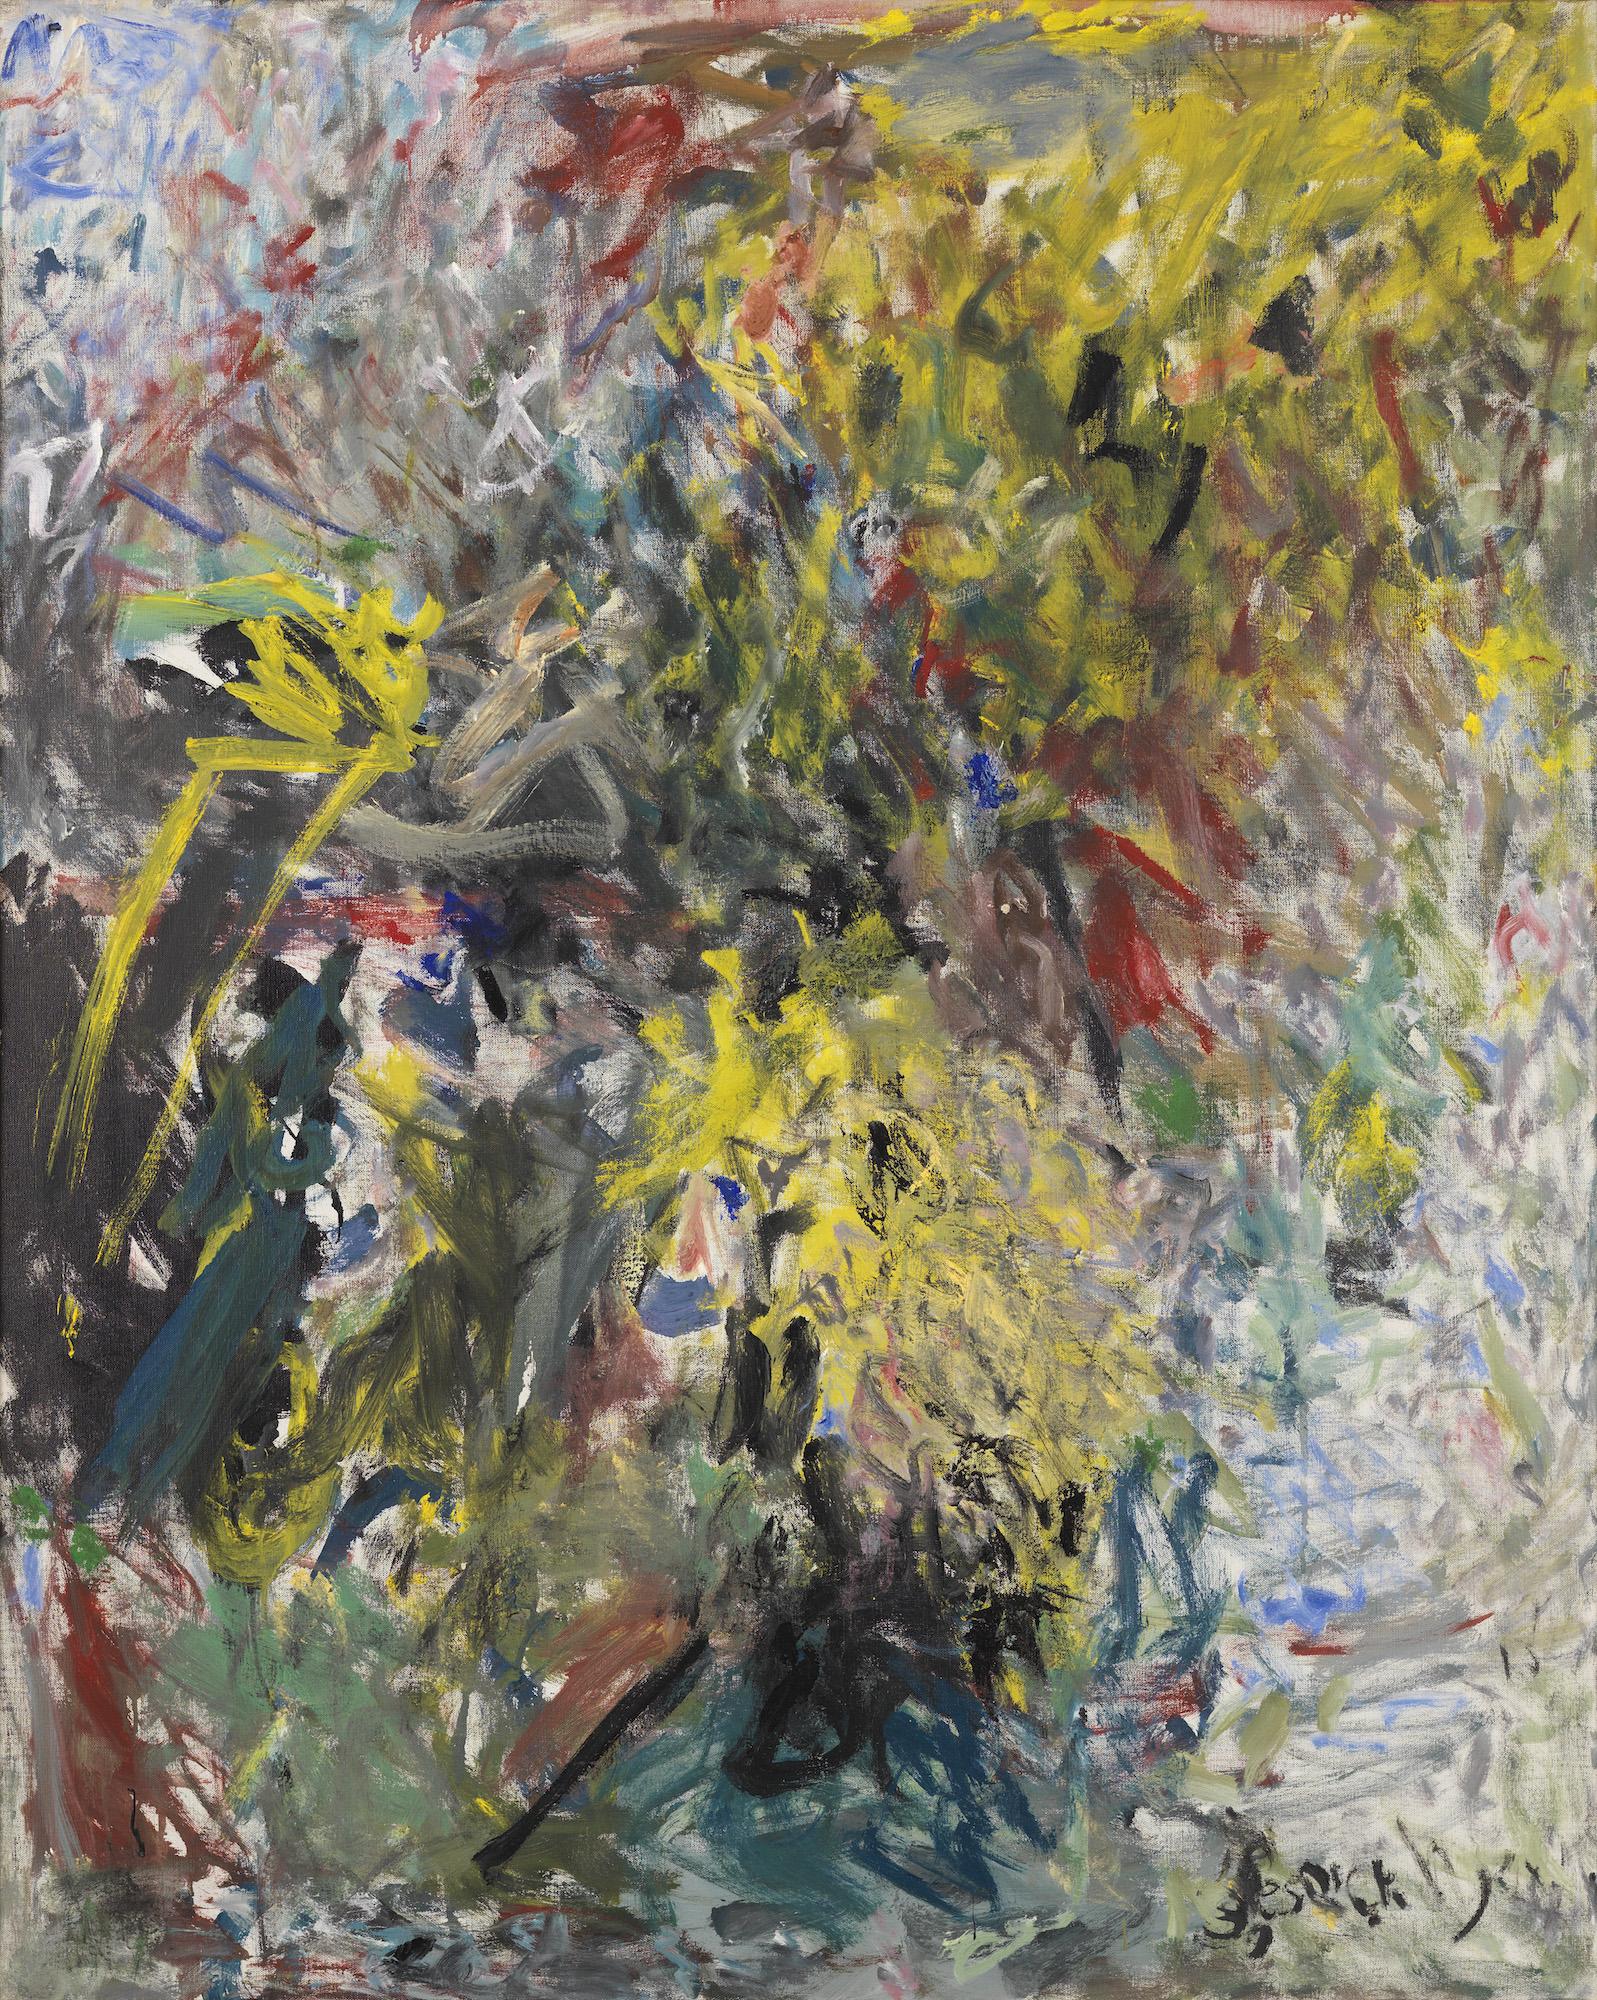 Milton Resnick  Boston , 1959 Oil on canvas 50 x 40 inches